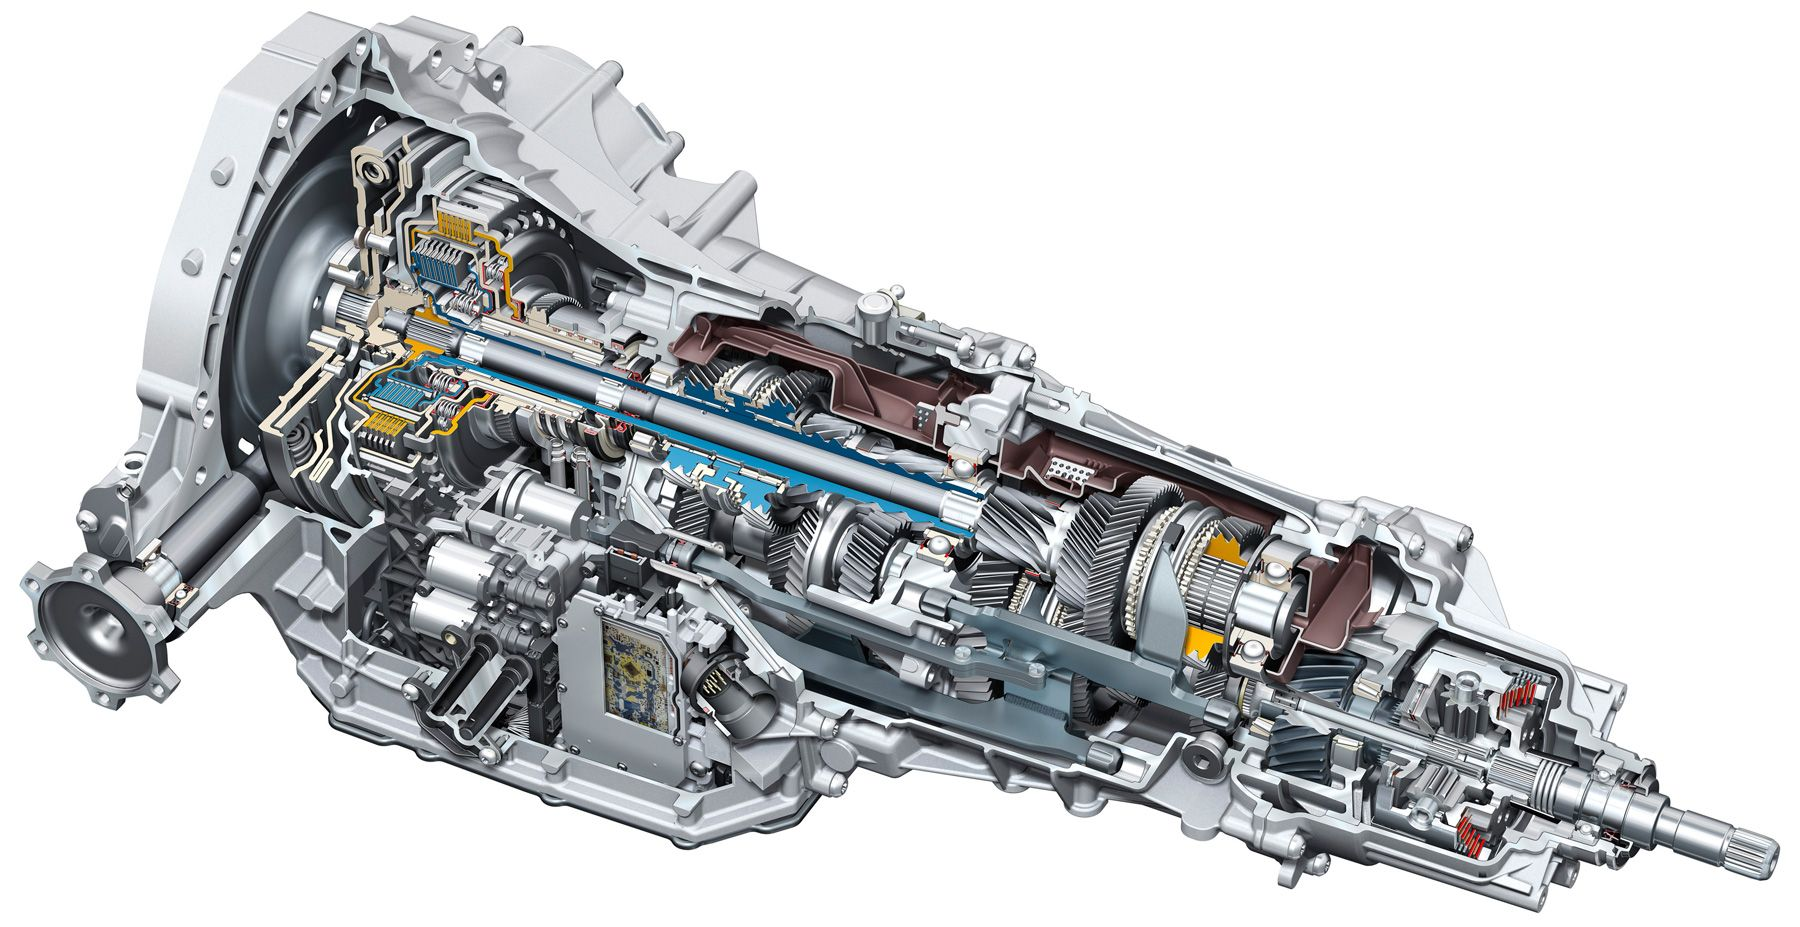 Diagram Volkswagen Cabriolet Cruise Control Wiring Schematic Thumb